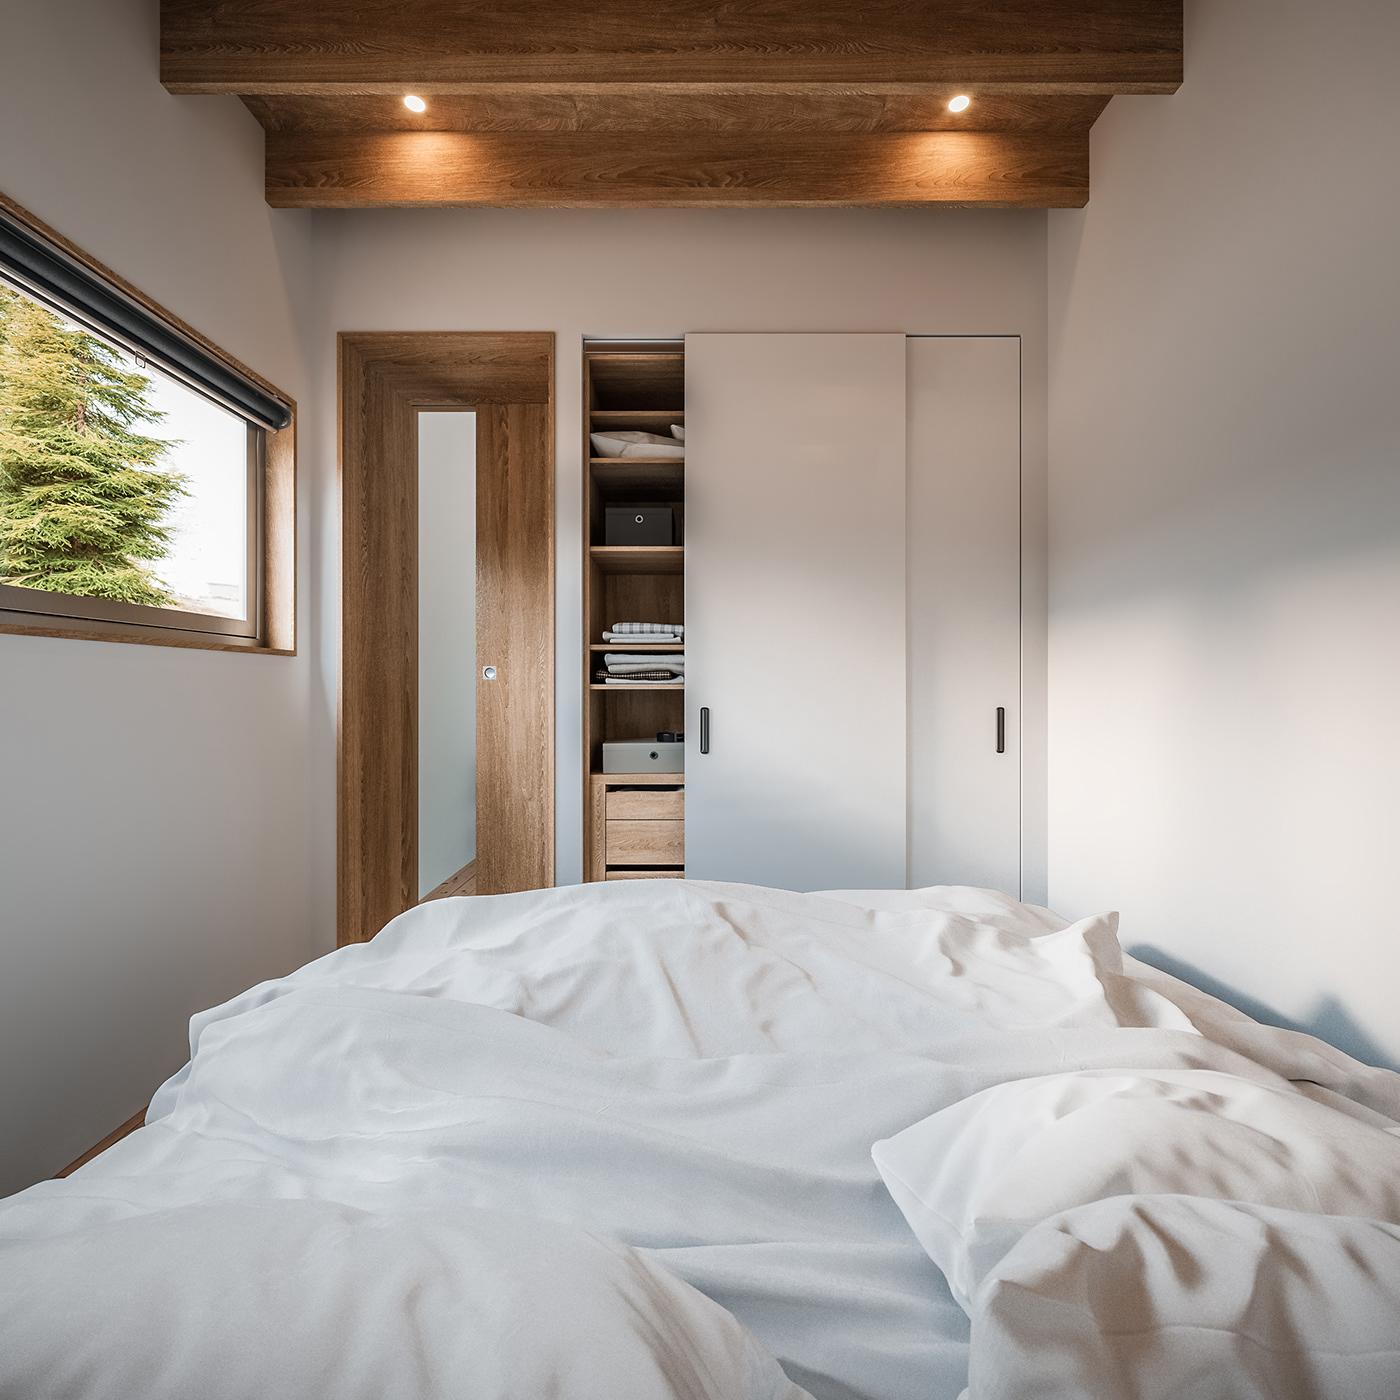 3D architecture archviz cabin CGI corona house Interior Render visualization